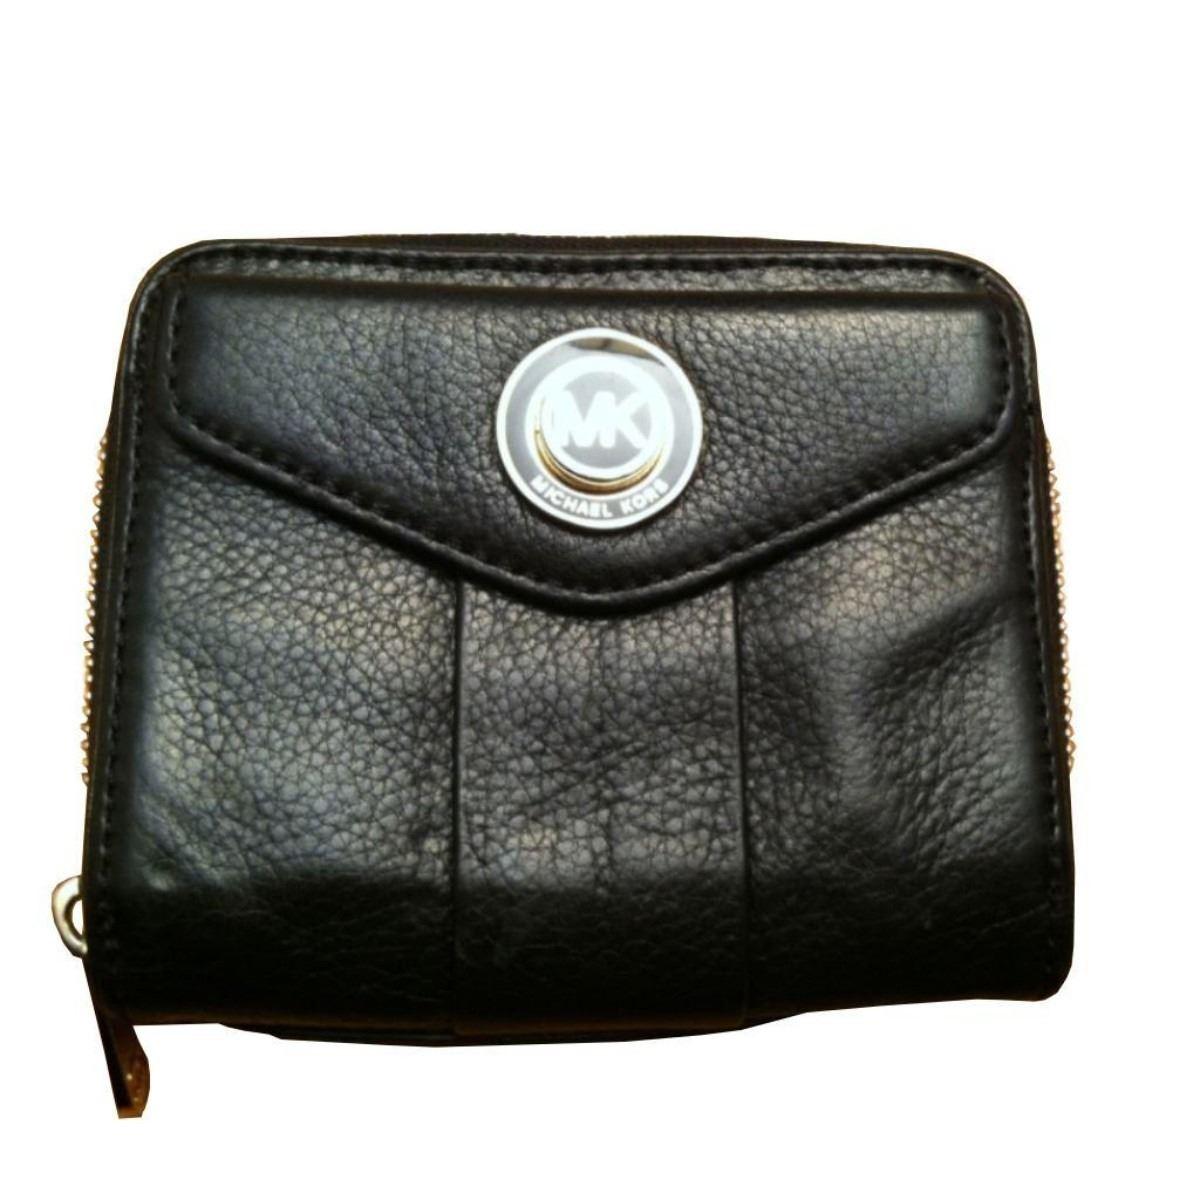 22fe41823678e8 Image 1 : Michael Kors Bi-fold Black Leather Wallet ...